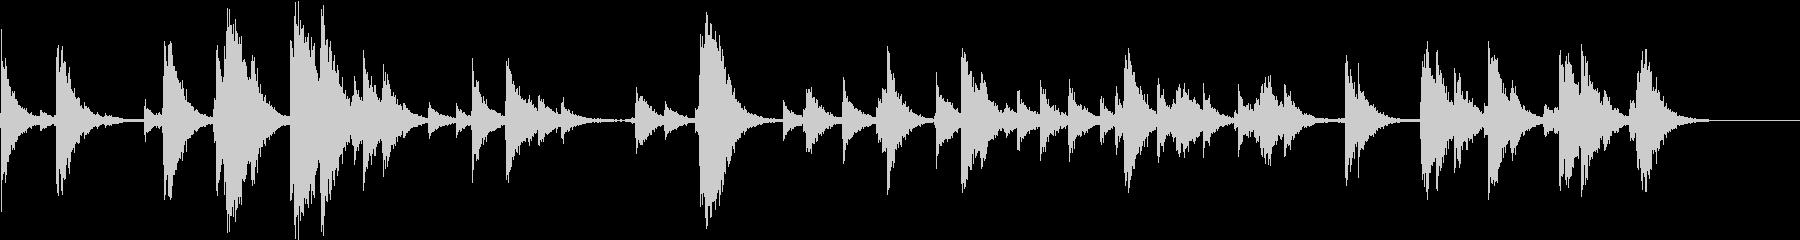 SFX 反響の大きな場所の階段を降る音の未再生の波形